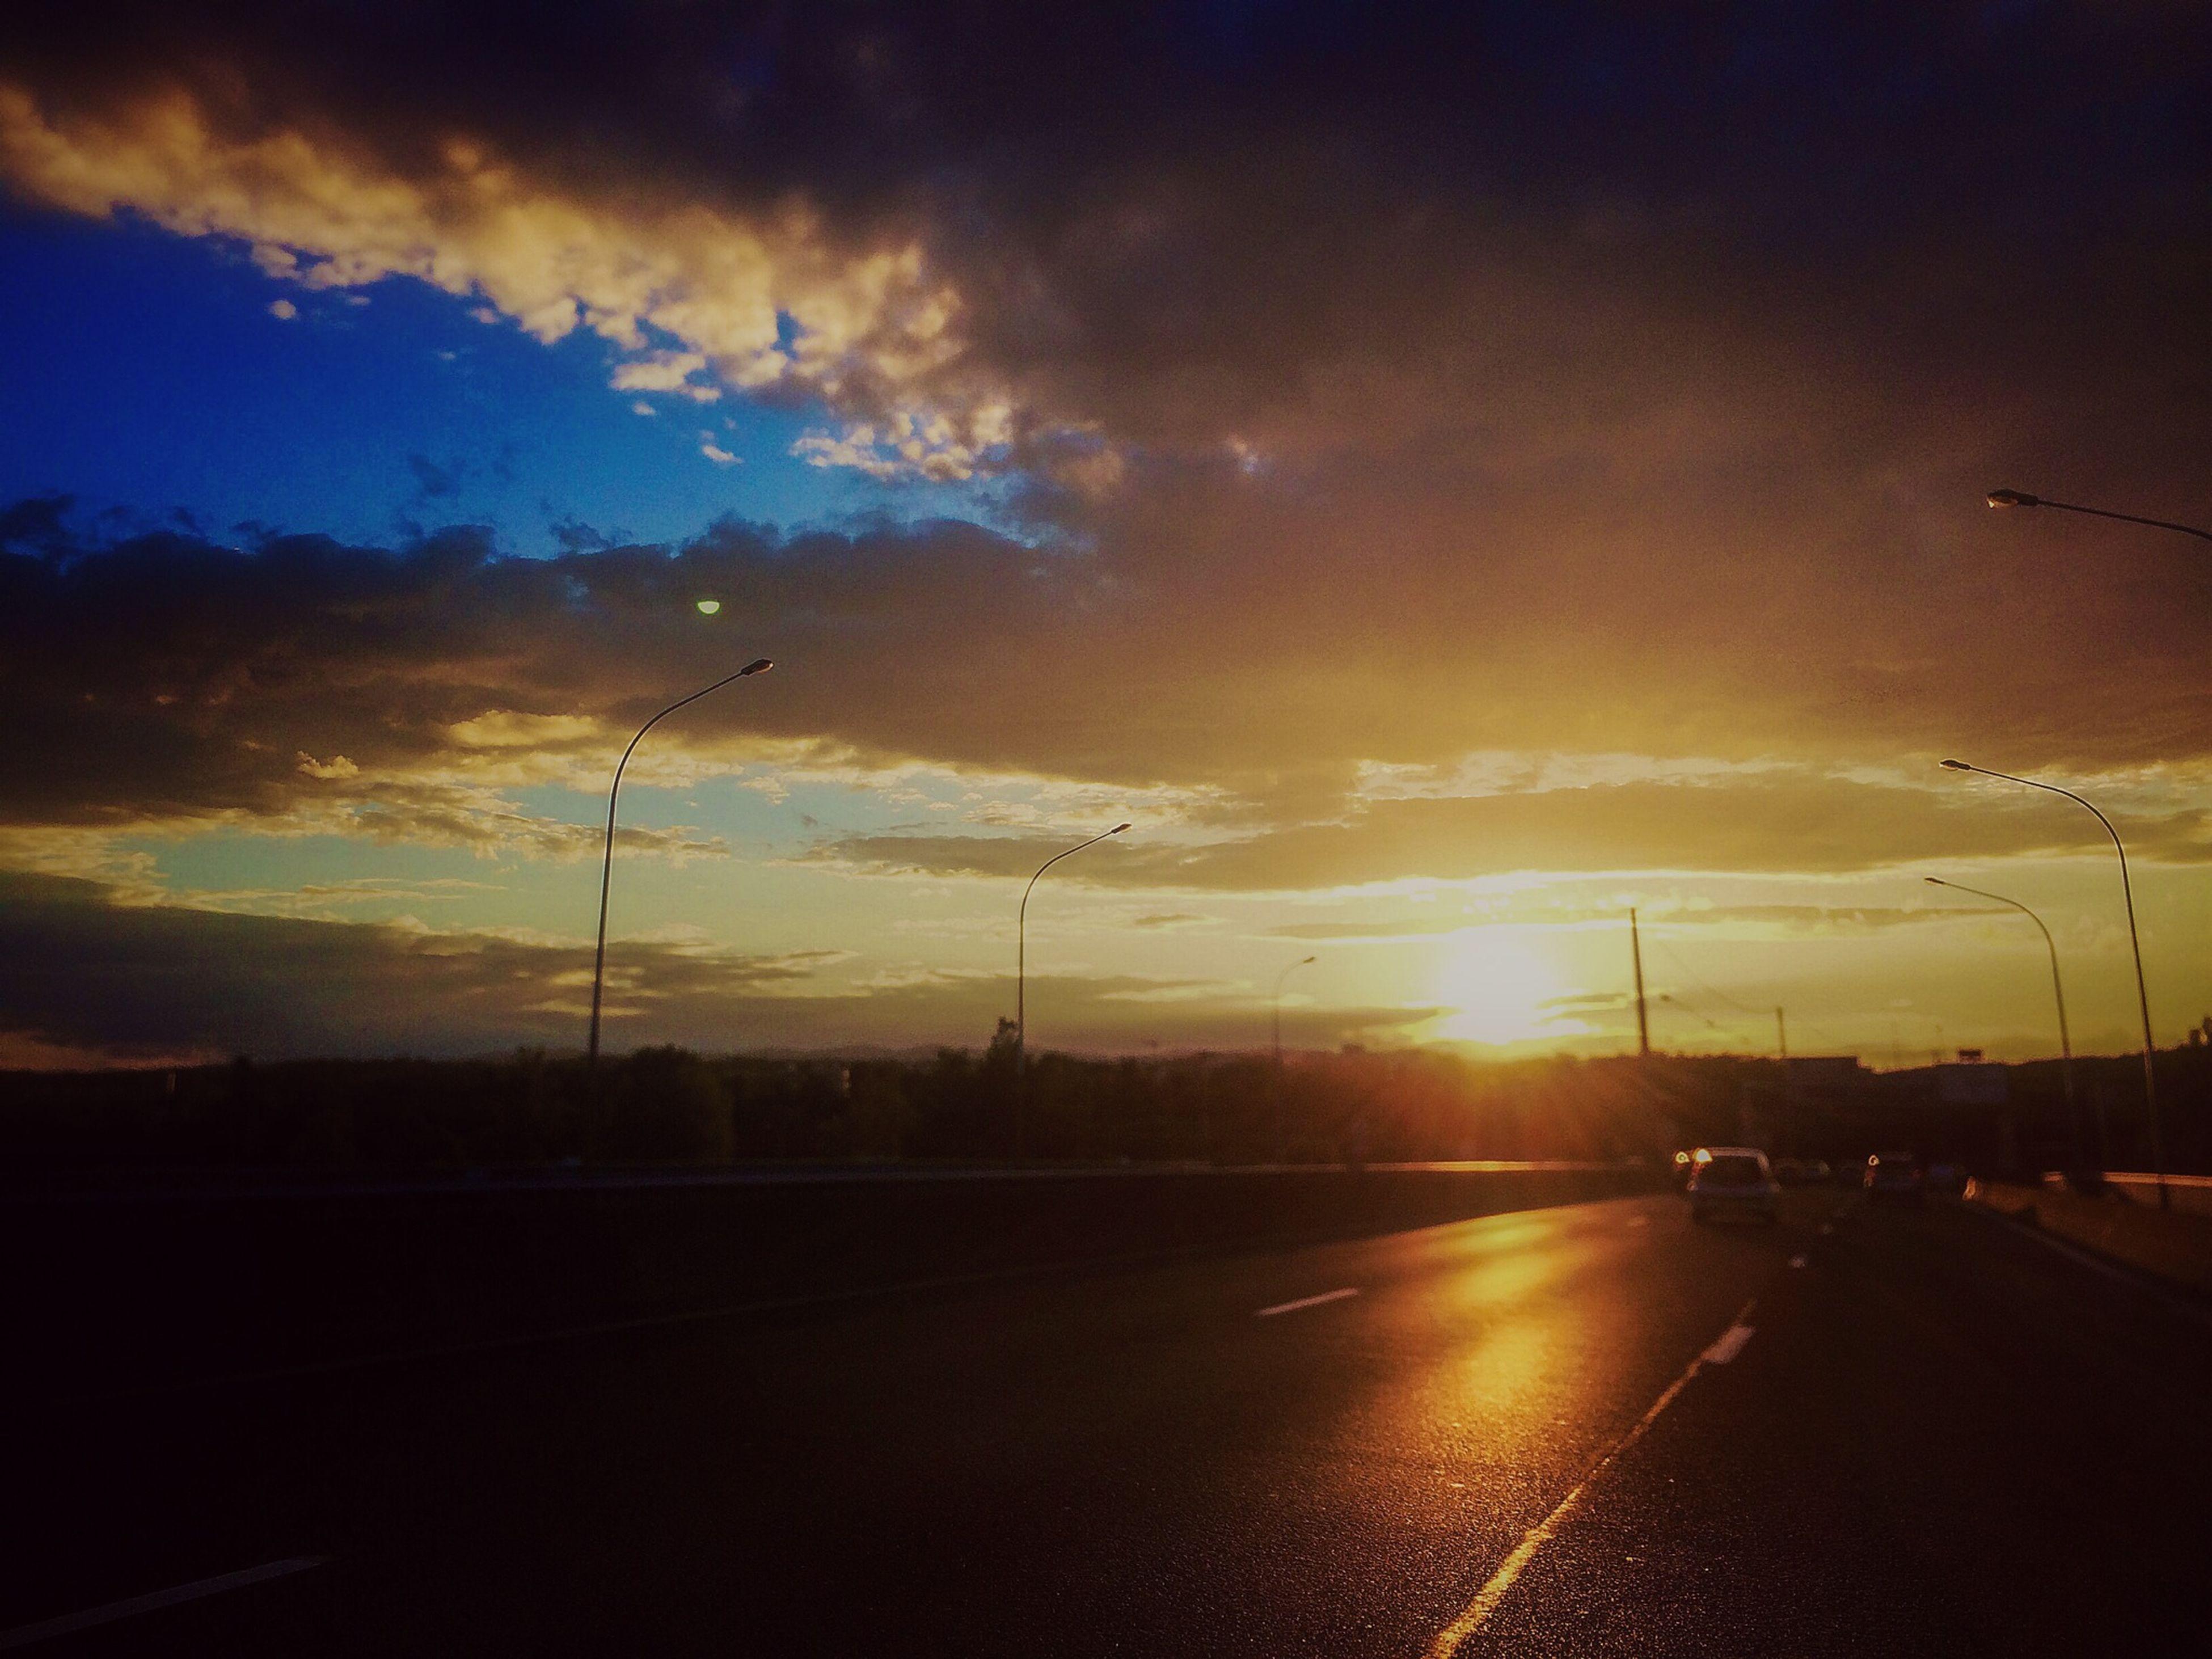 sunset, sky, transportation, silhouette, road, street light, cloud - sky, car, sun, street, electricity pylon, orange color, the way forward, nature, land vehicle, cloud, scenics, mode of transport, outdoors, beauty in nature